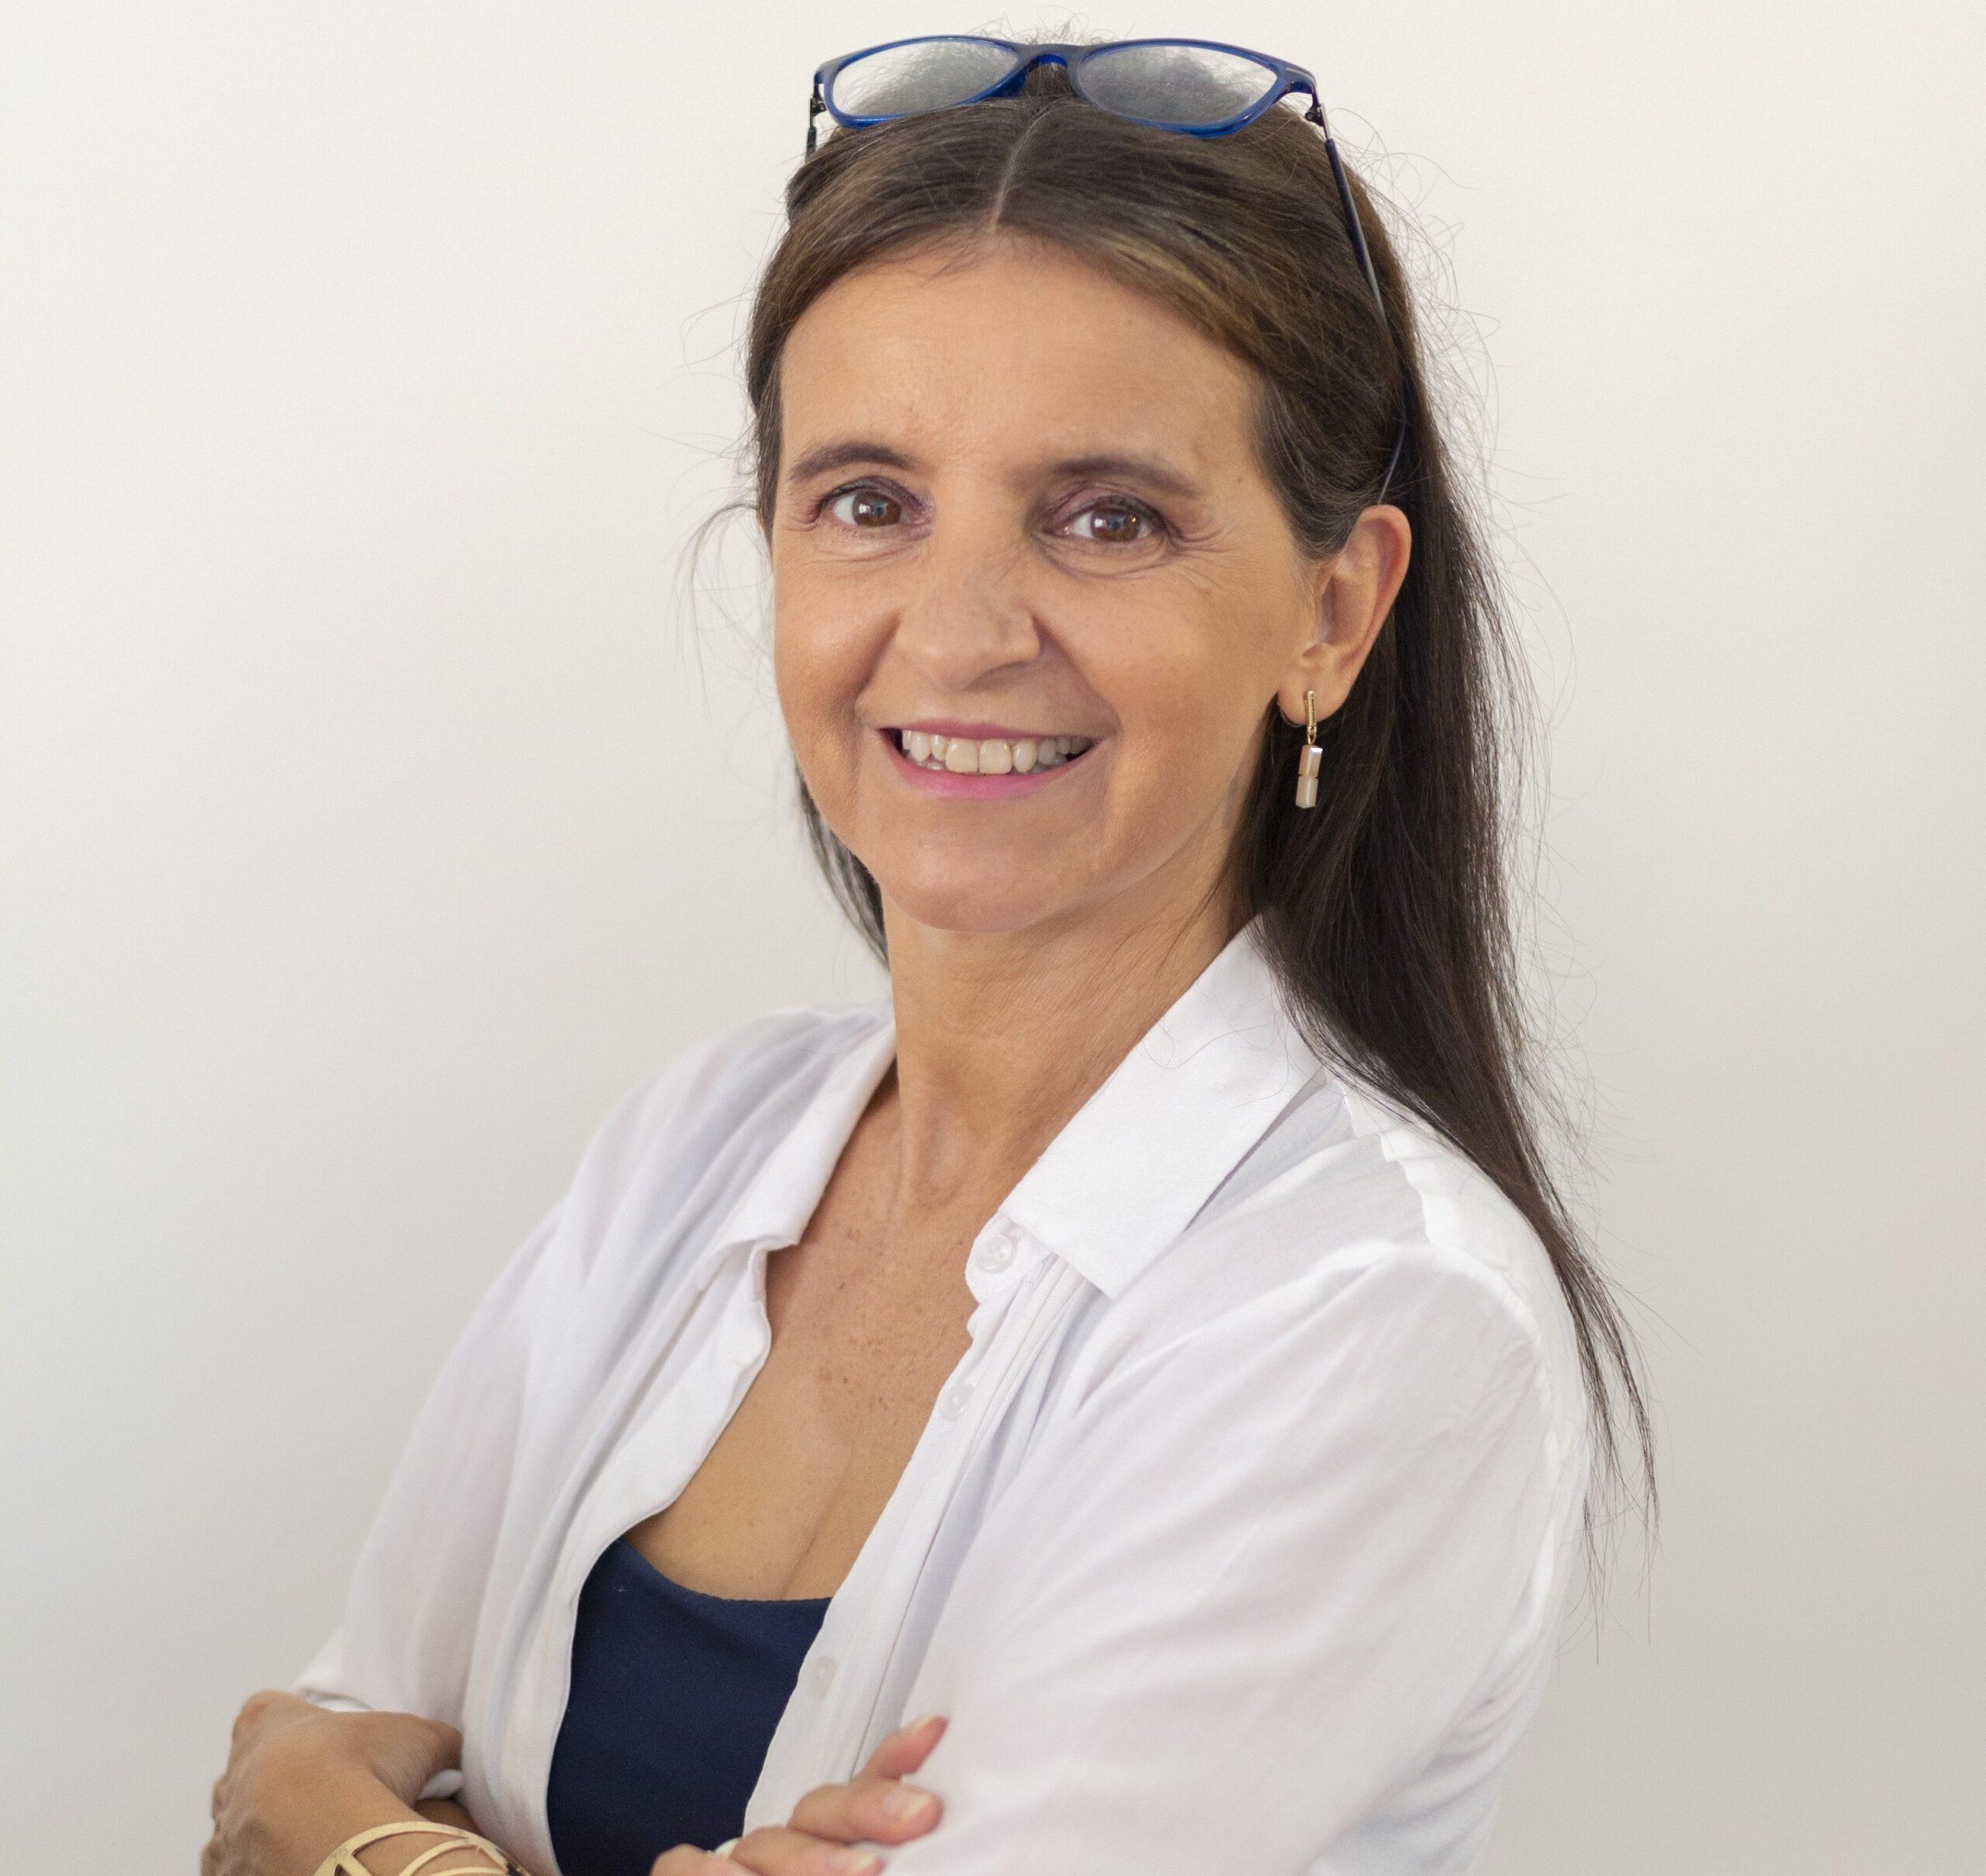 Dra. Gloria Medone